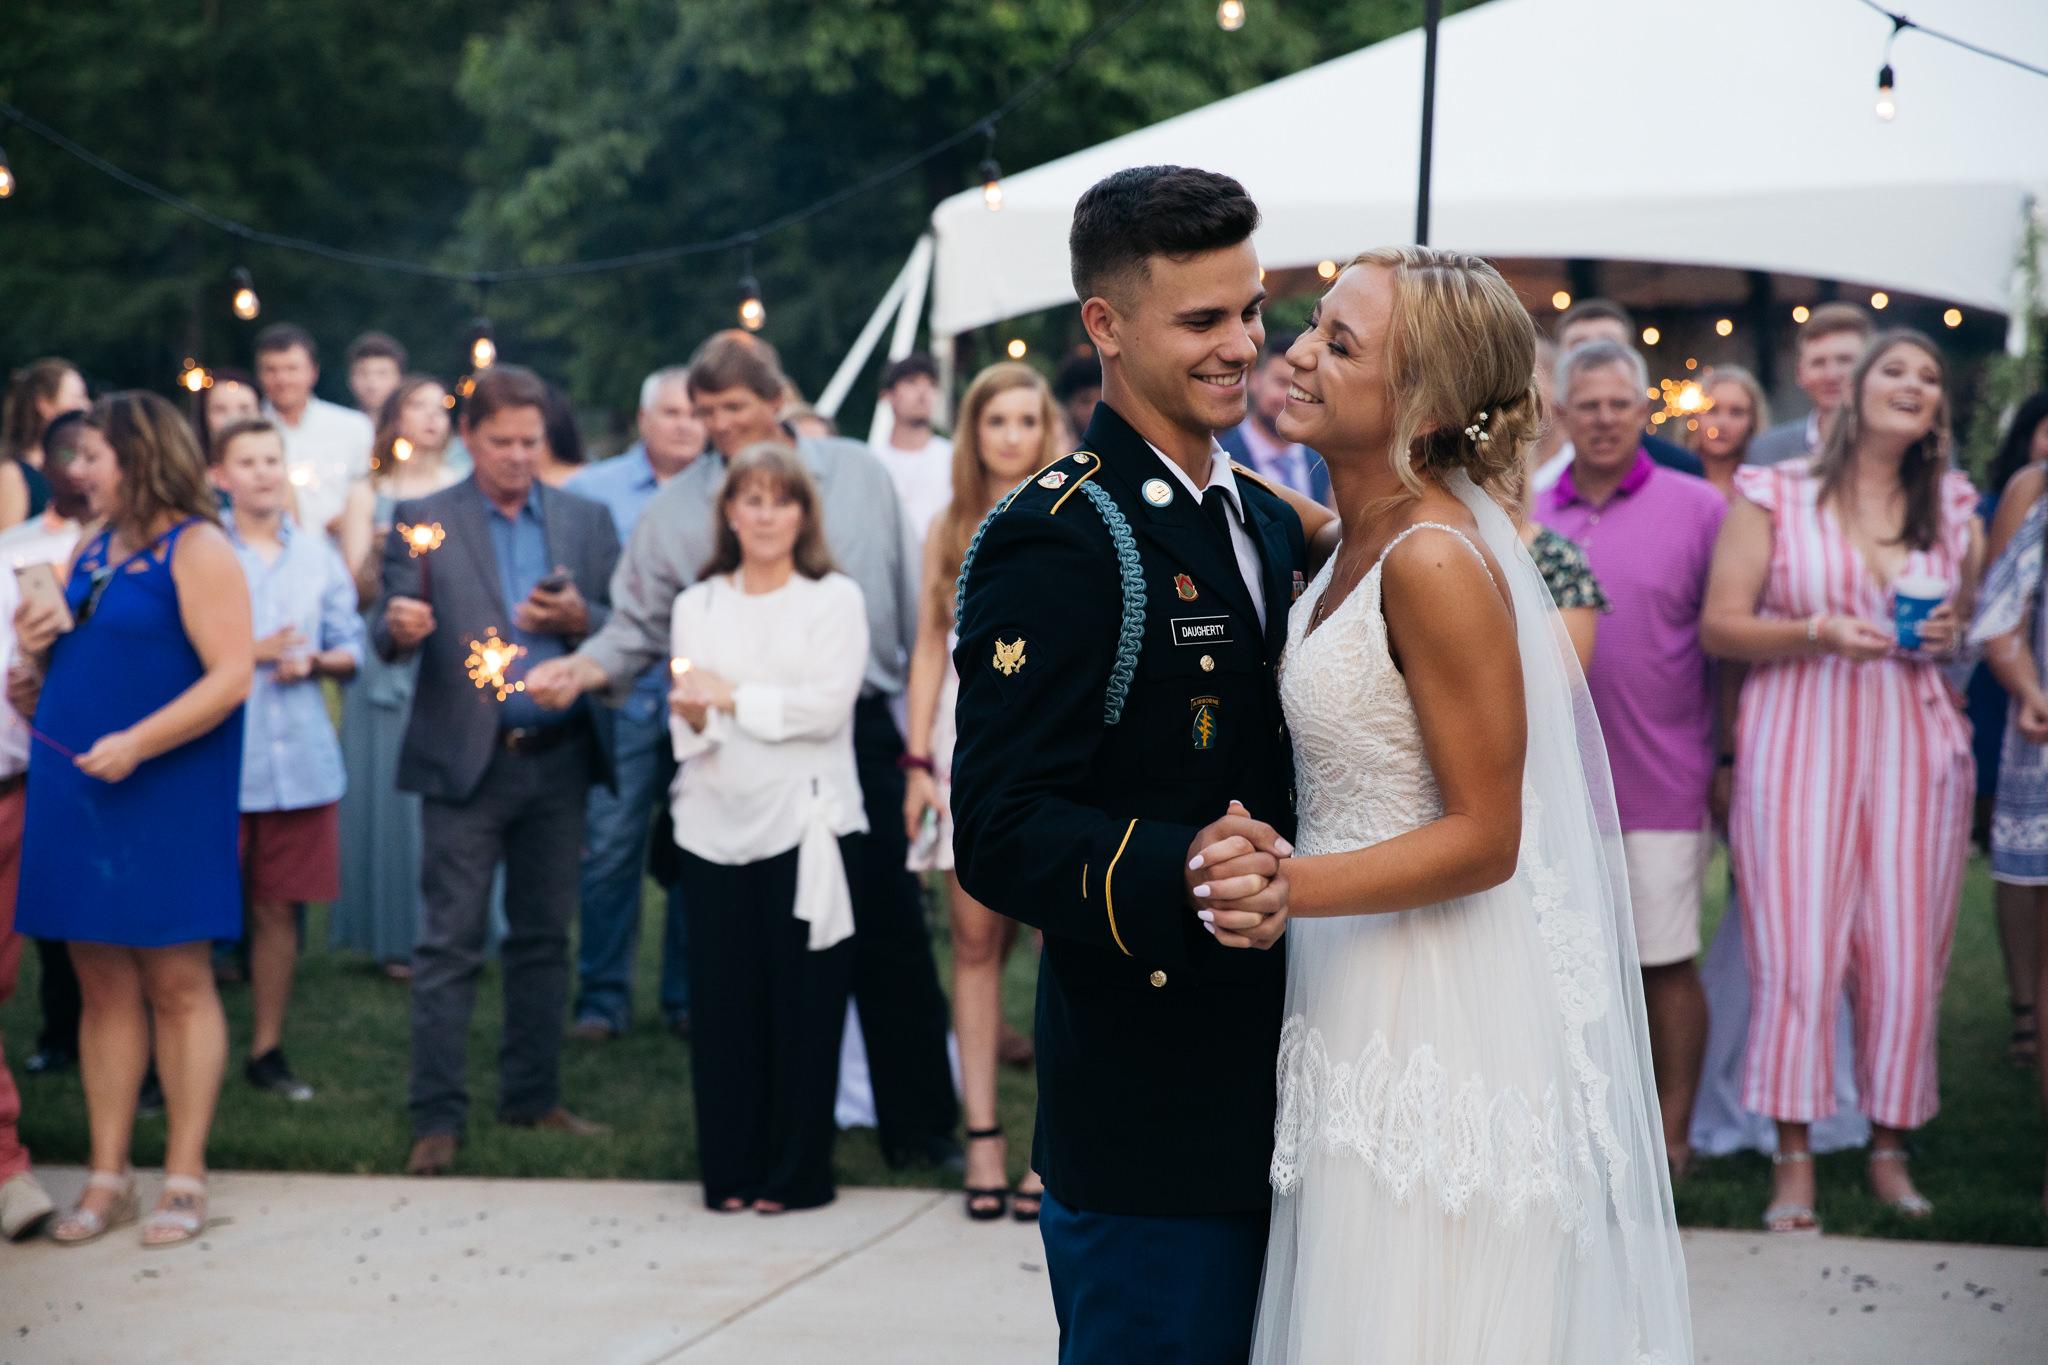 backyard-wedding-thewarmtharoundyou-lexy-branson-15.jpg